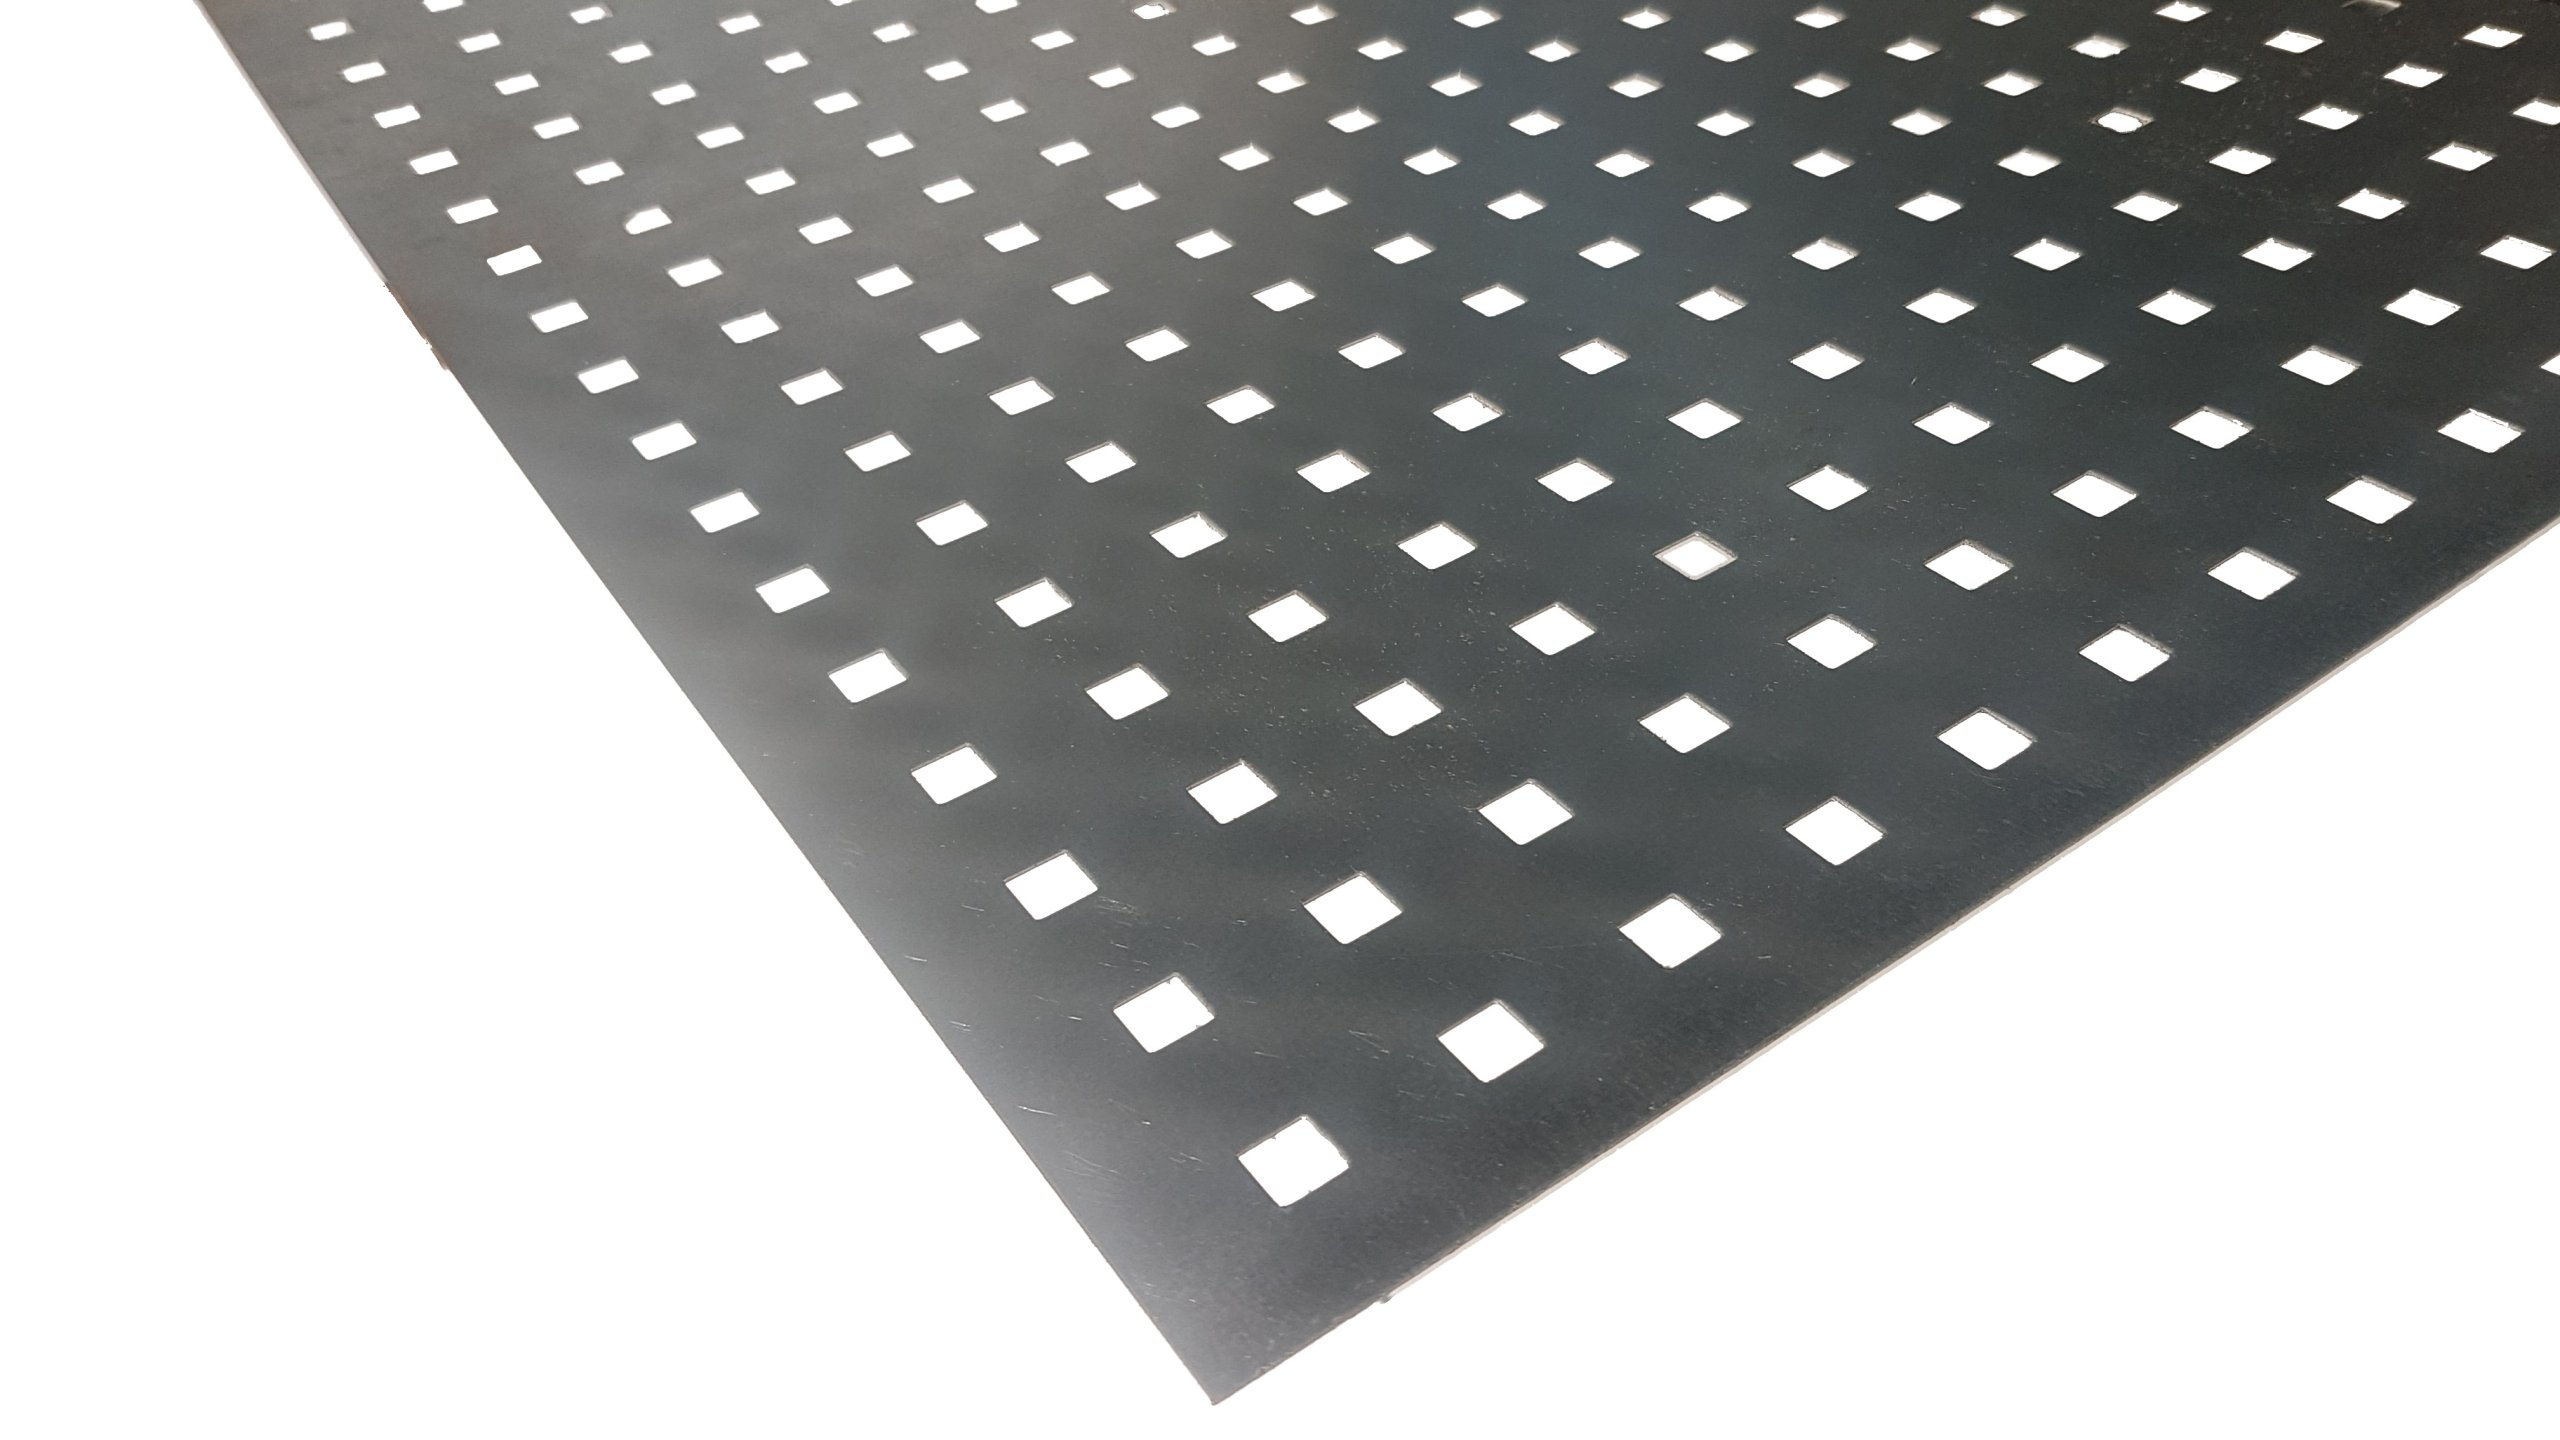 BLACHA PERFOROWANA 1000 x 2000 OCYNK 1 mm Qg 10-30